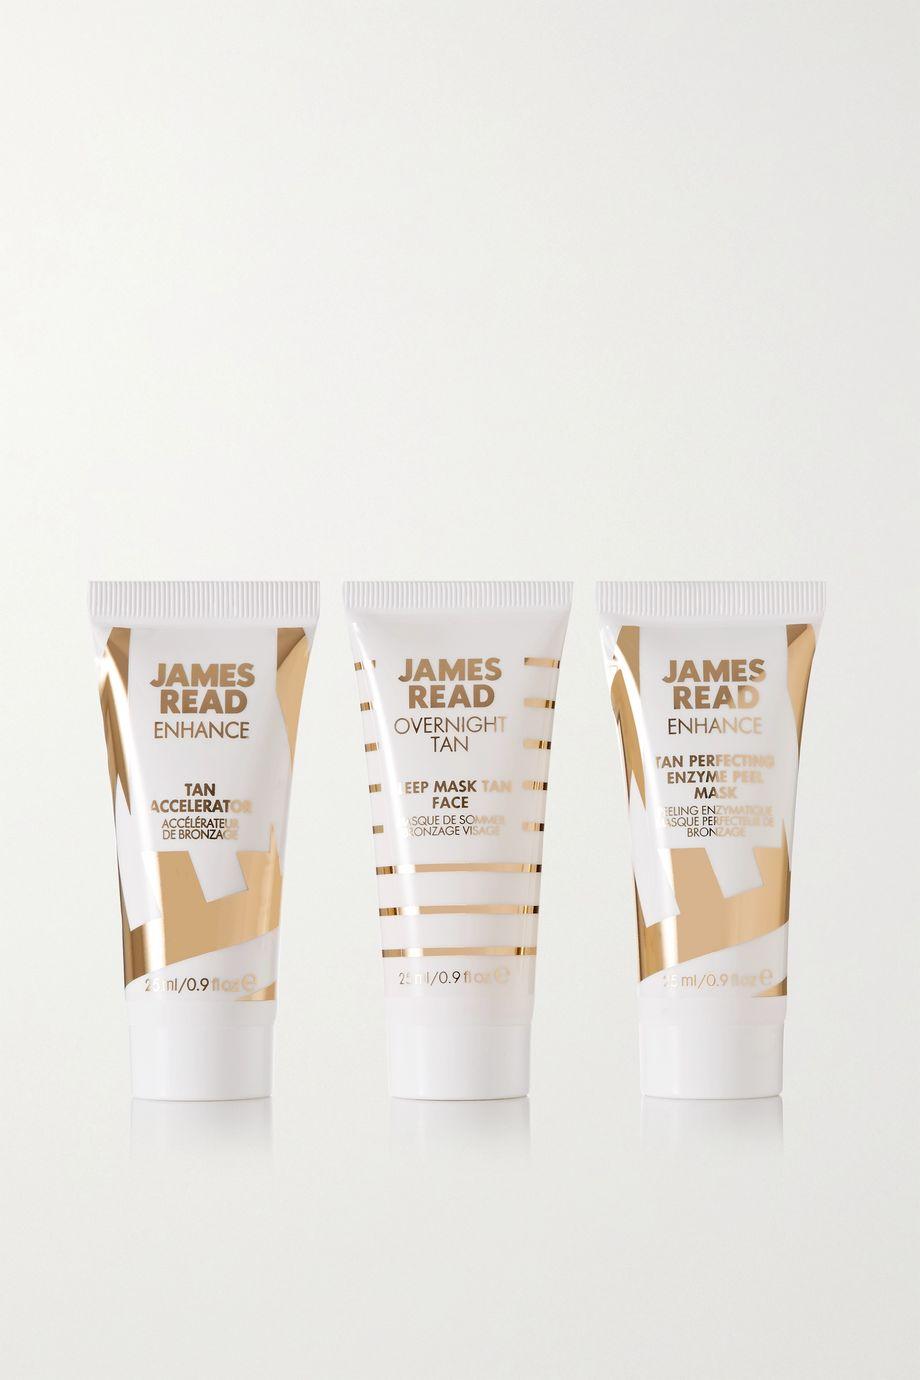 James Read Tan Edit Face Kit